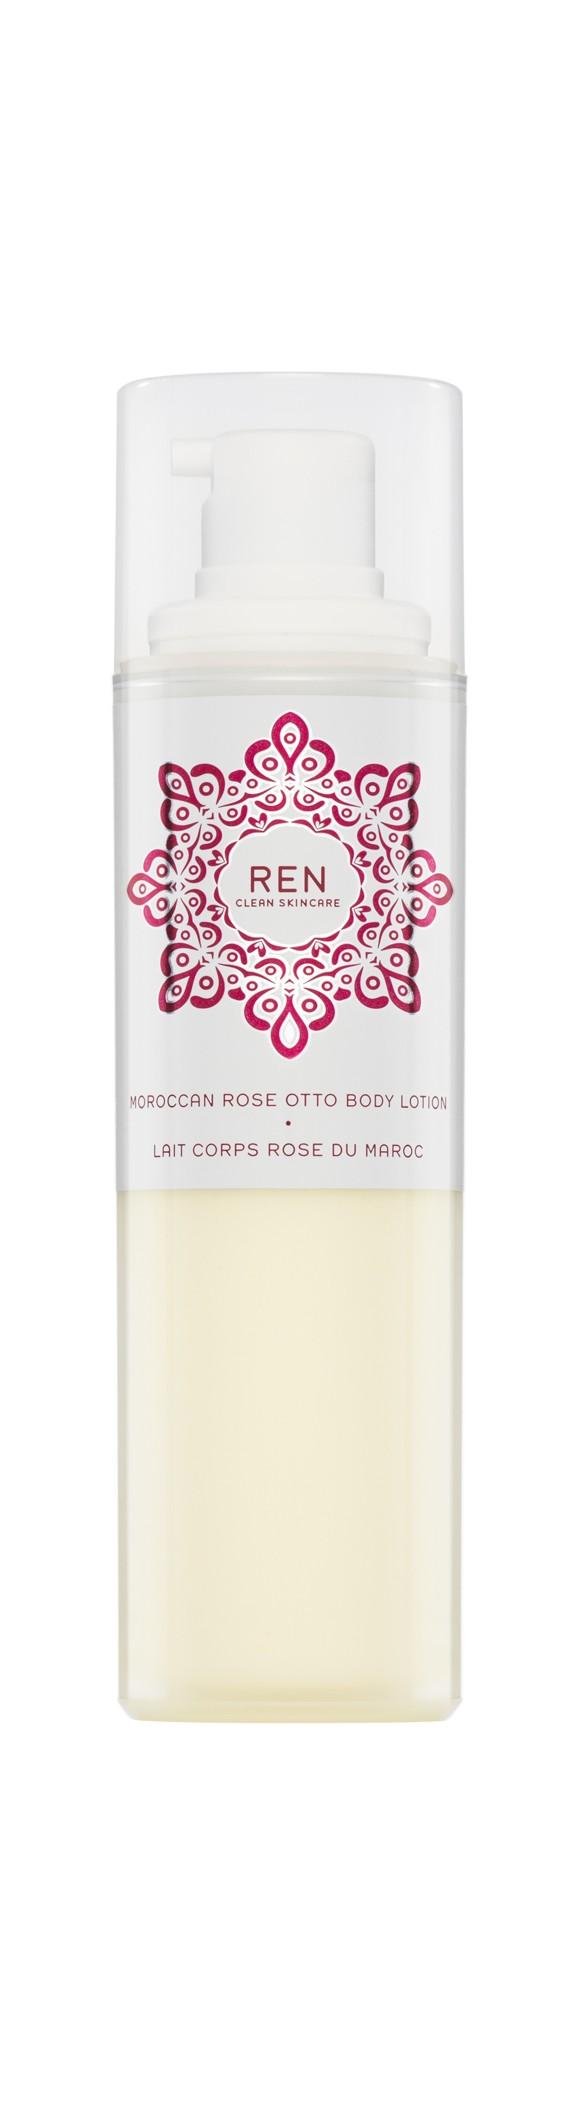 REN - Moroccan Rose Otto Body Lotion 200 ml